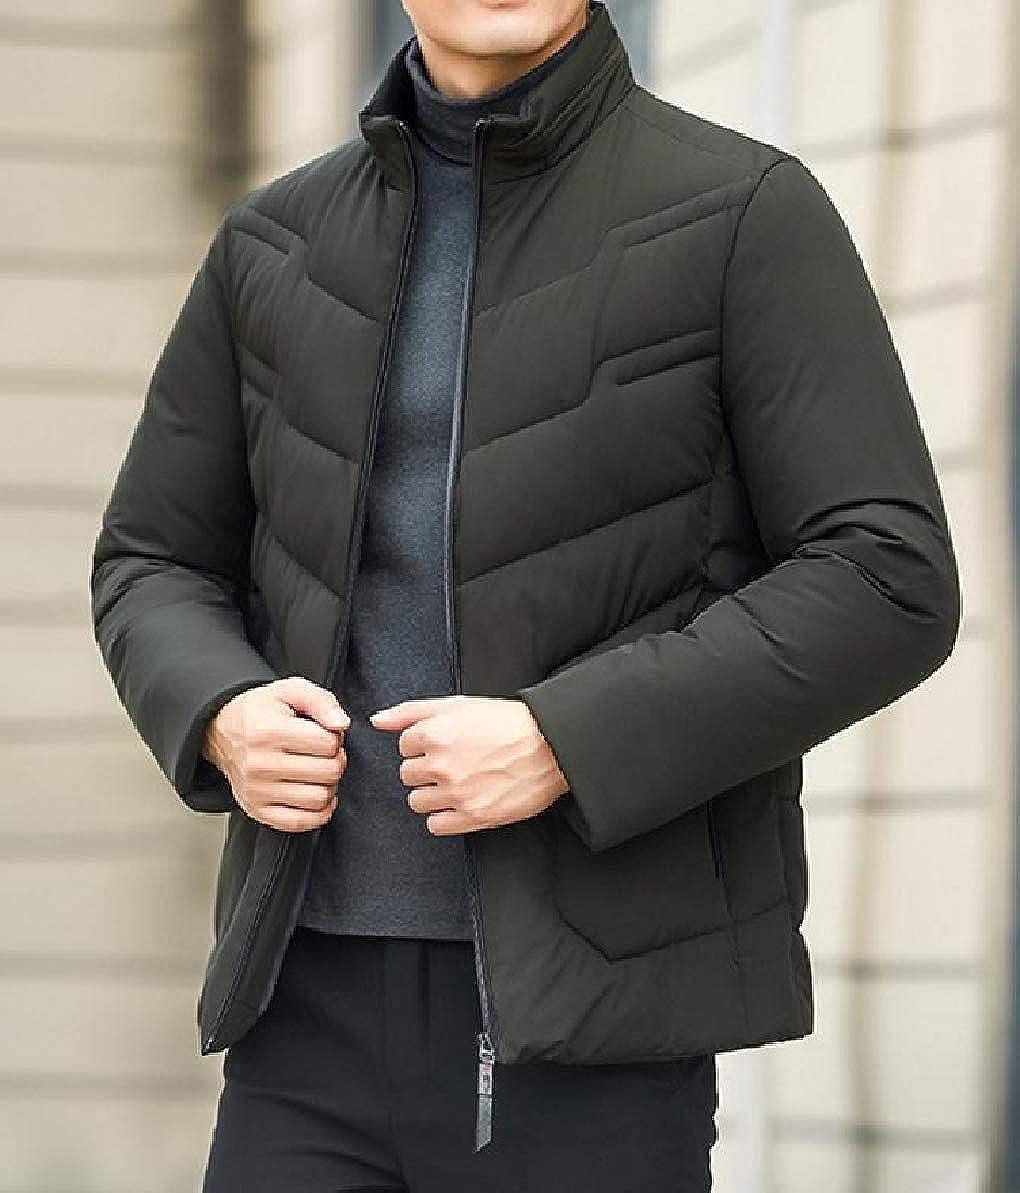 Zimaes-Men Warm Puffer Full-Zip Outwear Short Style Winter Stand Collar Down Coat